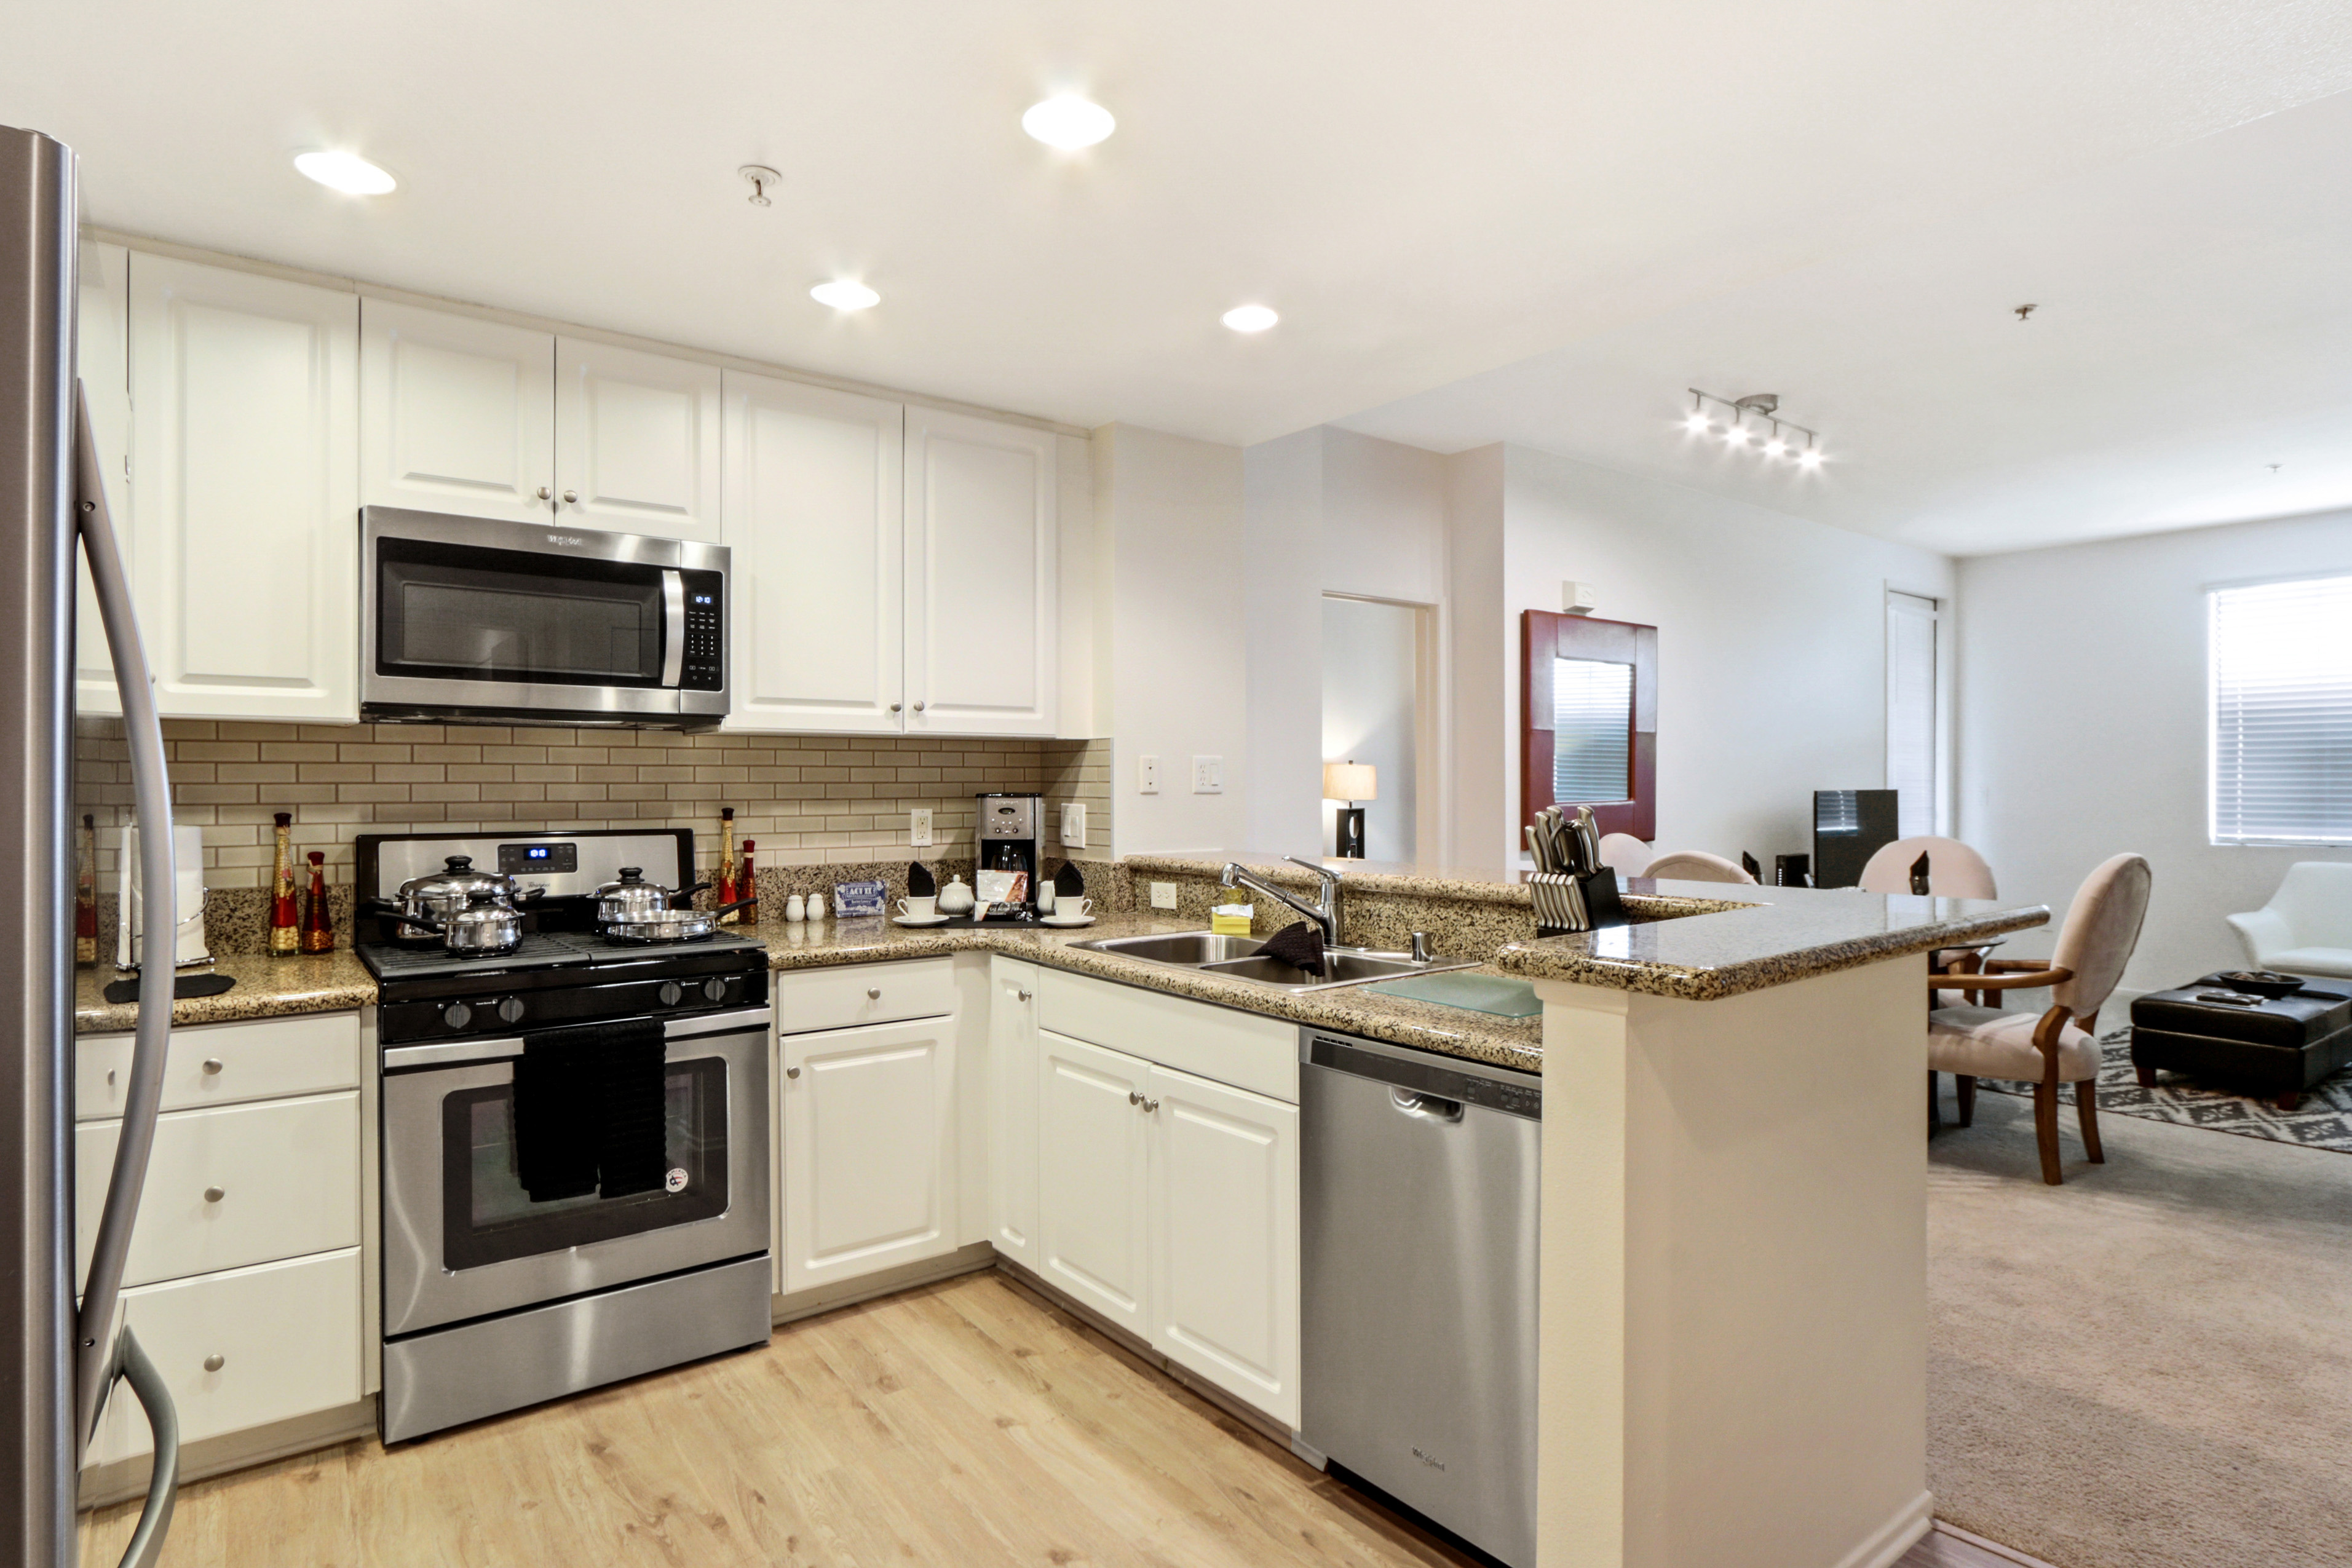 image 3 furnished 2 bedroom Apartment for rent in Irvine, Orange County